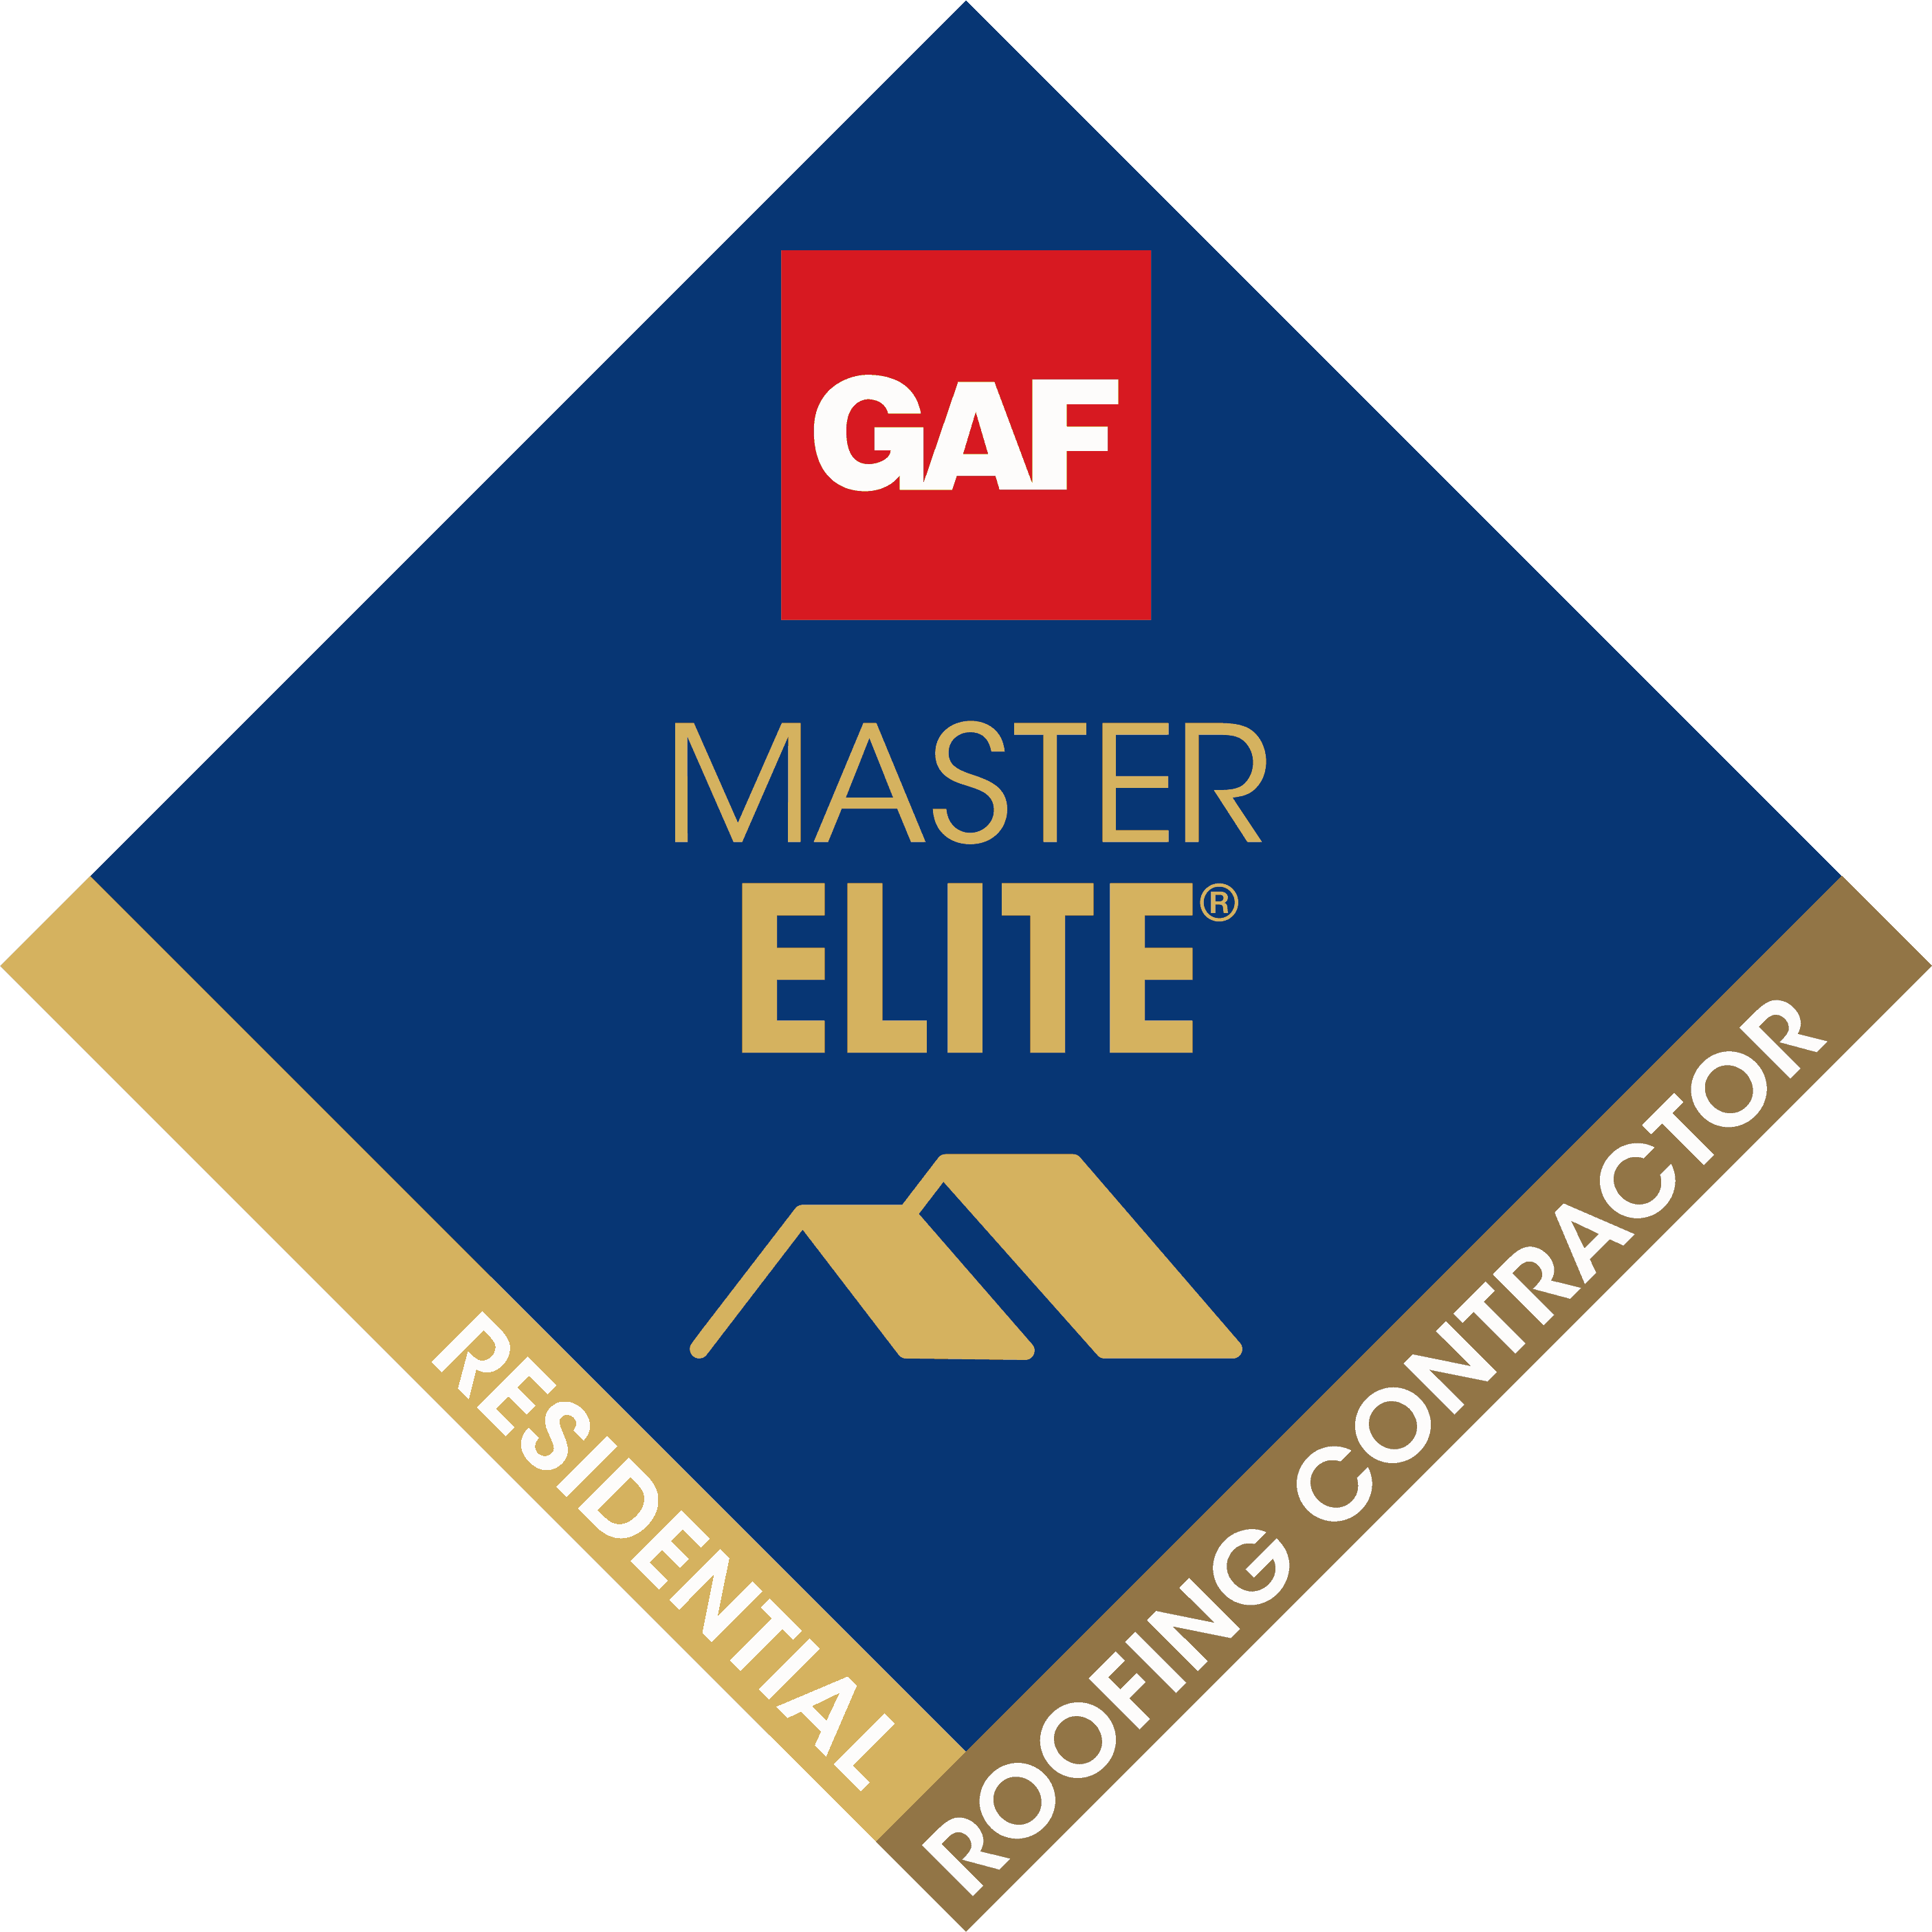 master elite